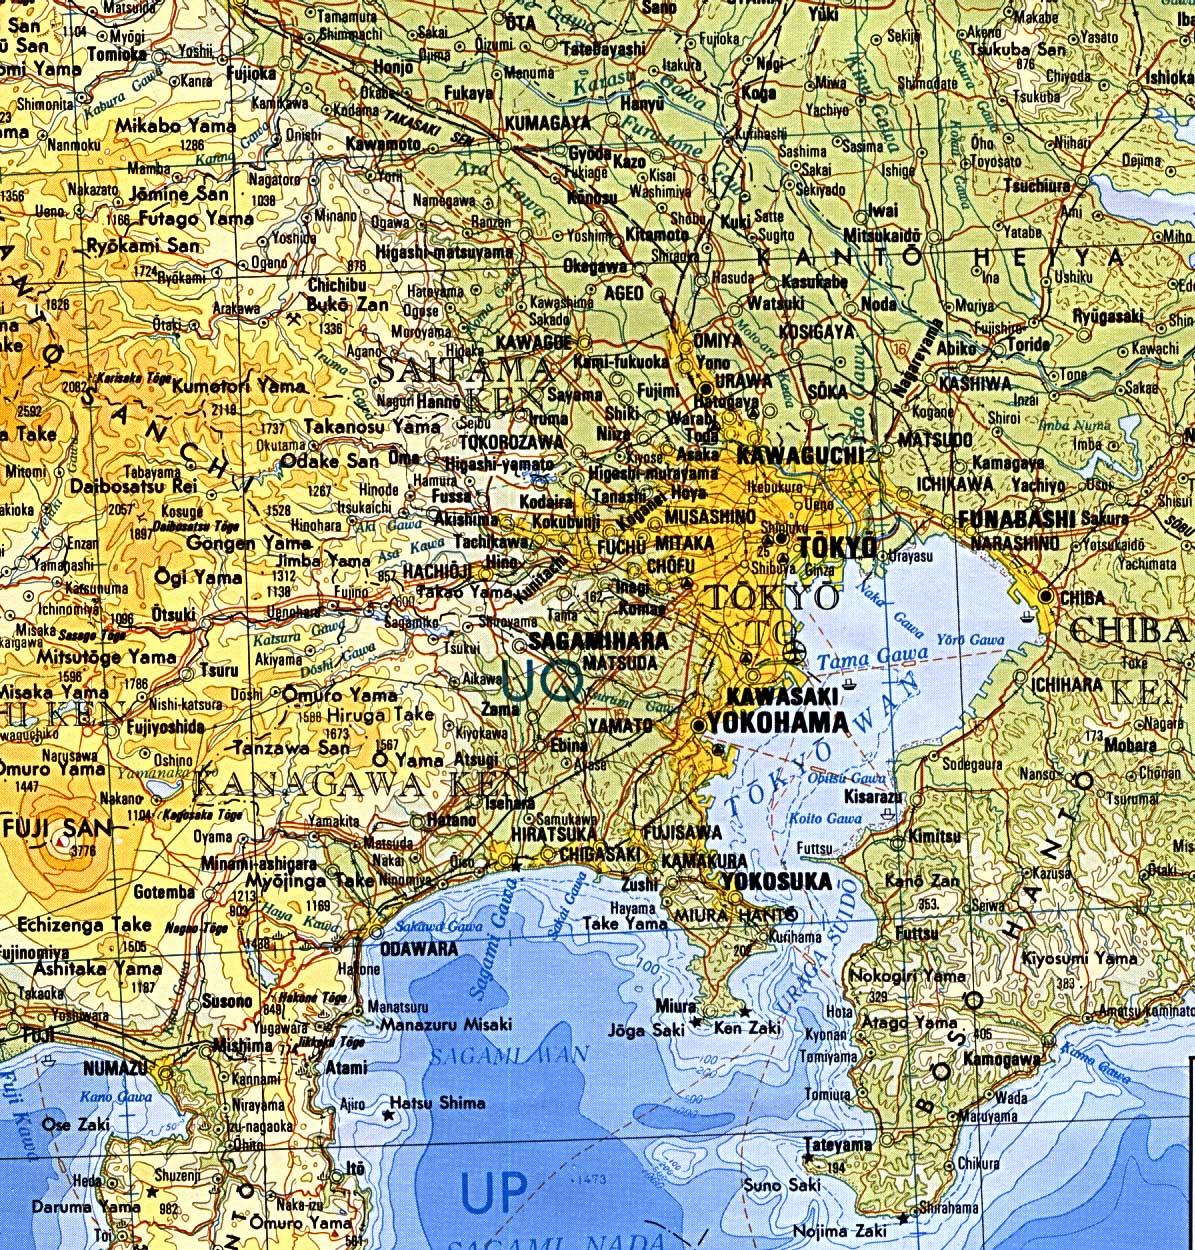 Map of Tokyo Region : Worldofmaps.net - online Maps and Travel ...